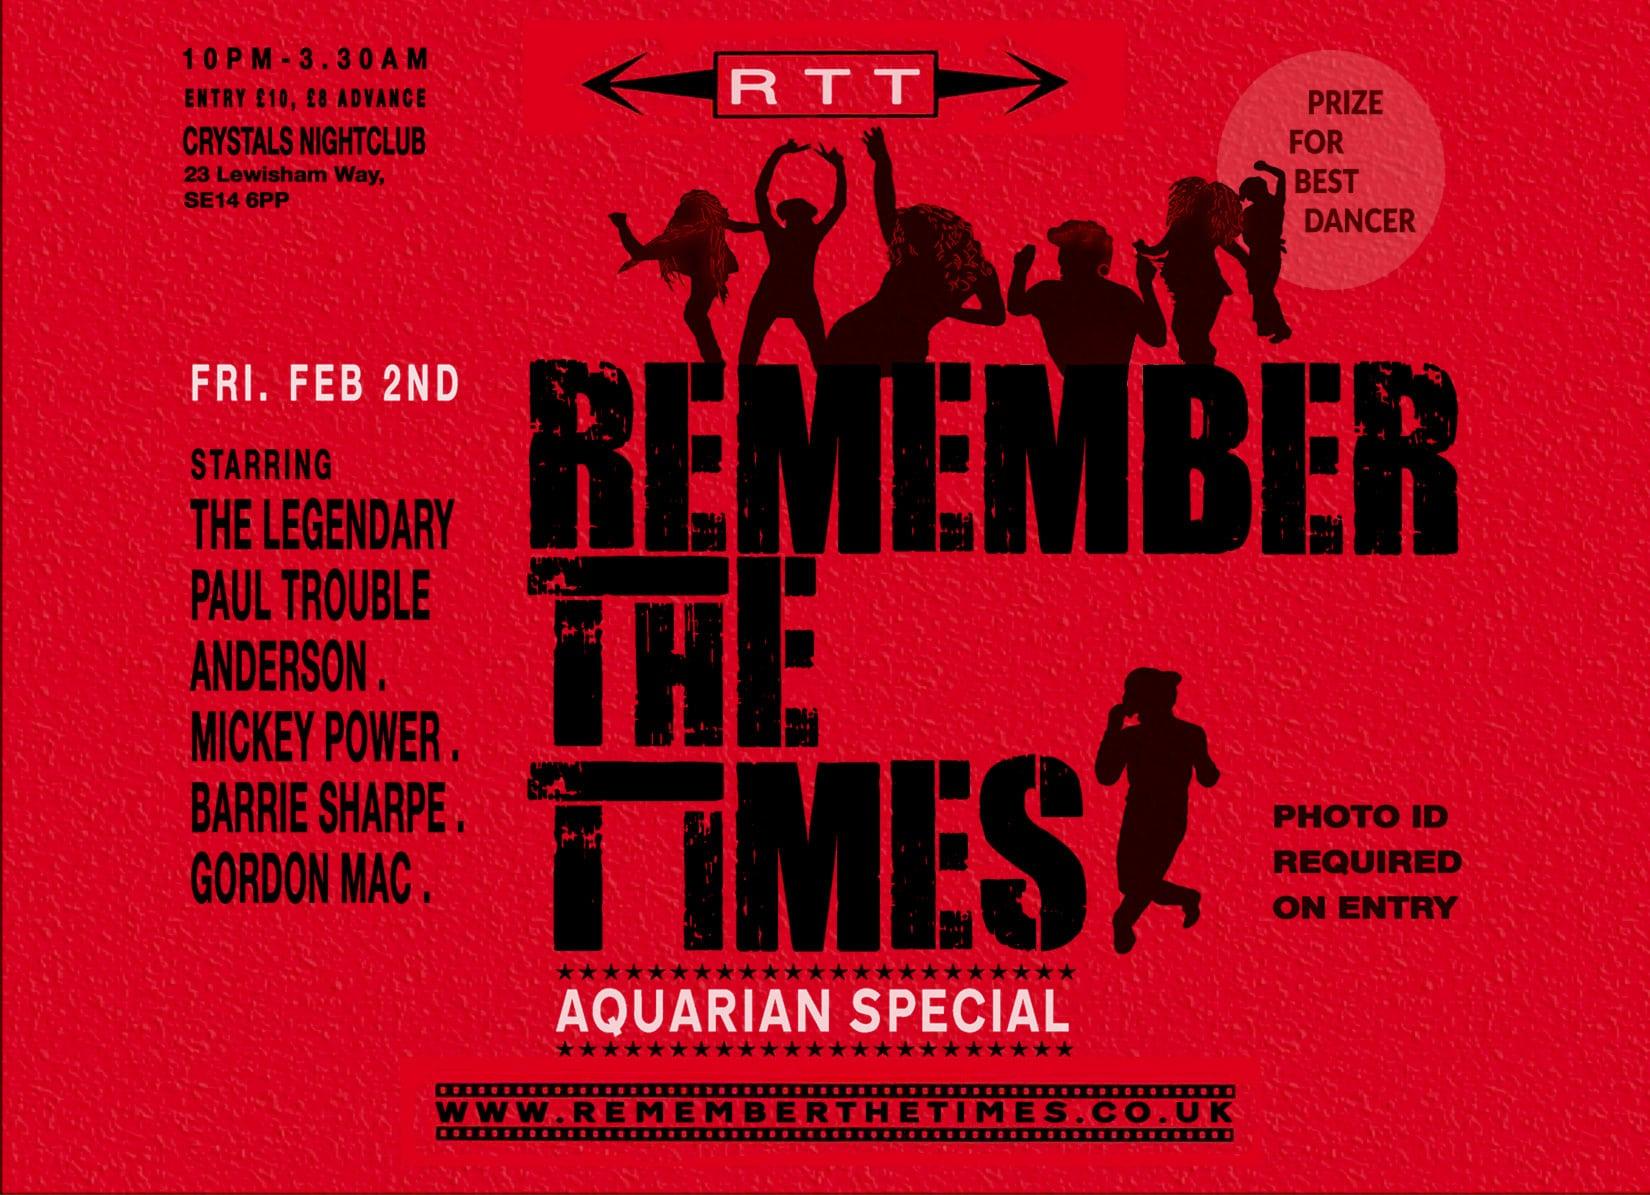 RTT LONDON SOUL NIGHT AQUARIAN SPECIAL DJ'S PAUL TROUBLE ANDERSON GORDON MAC BARRIE SHARPE MICKEY POWER